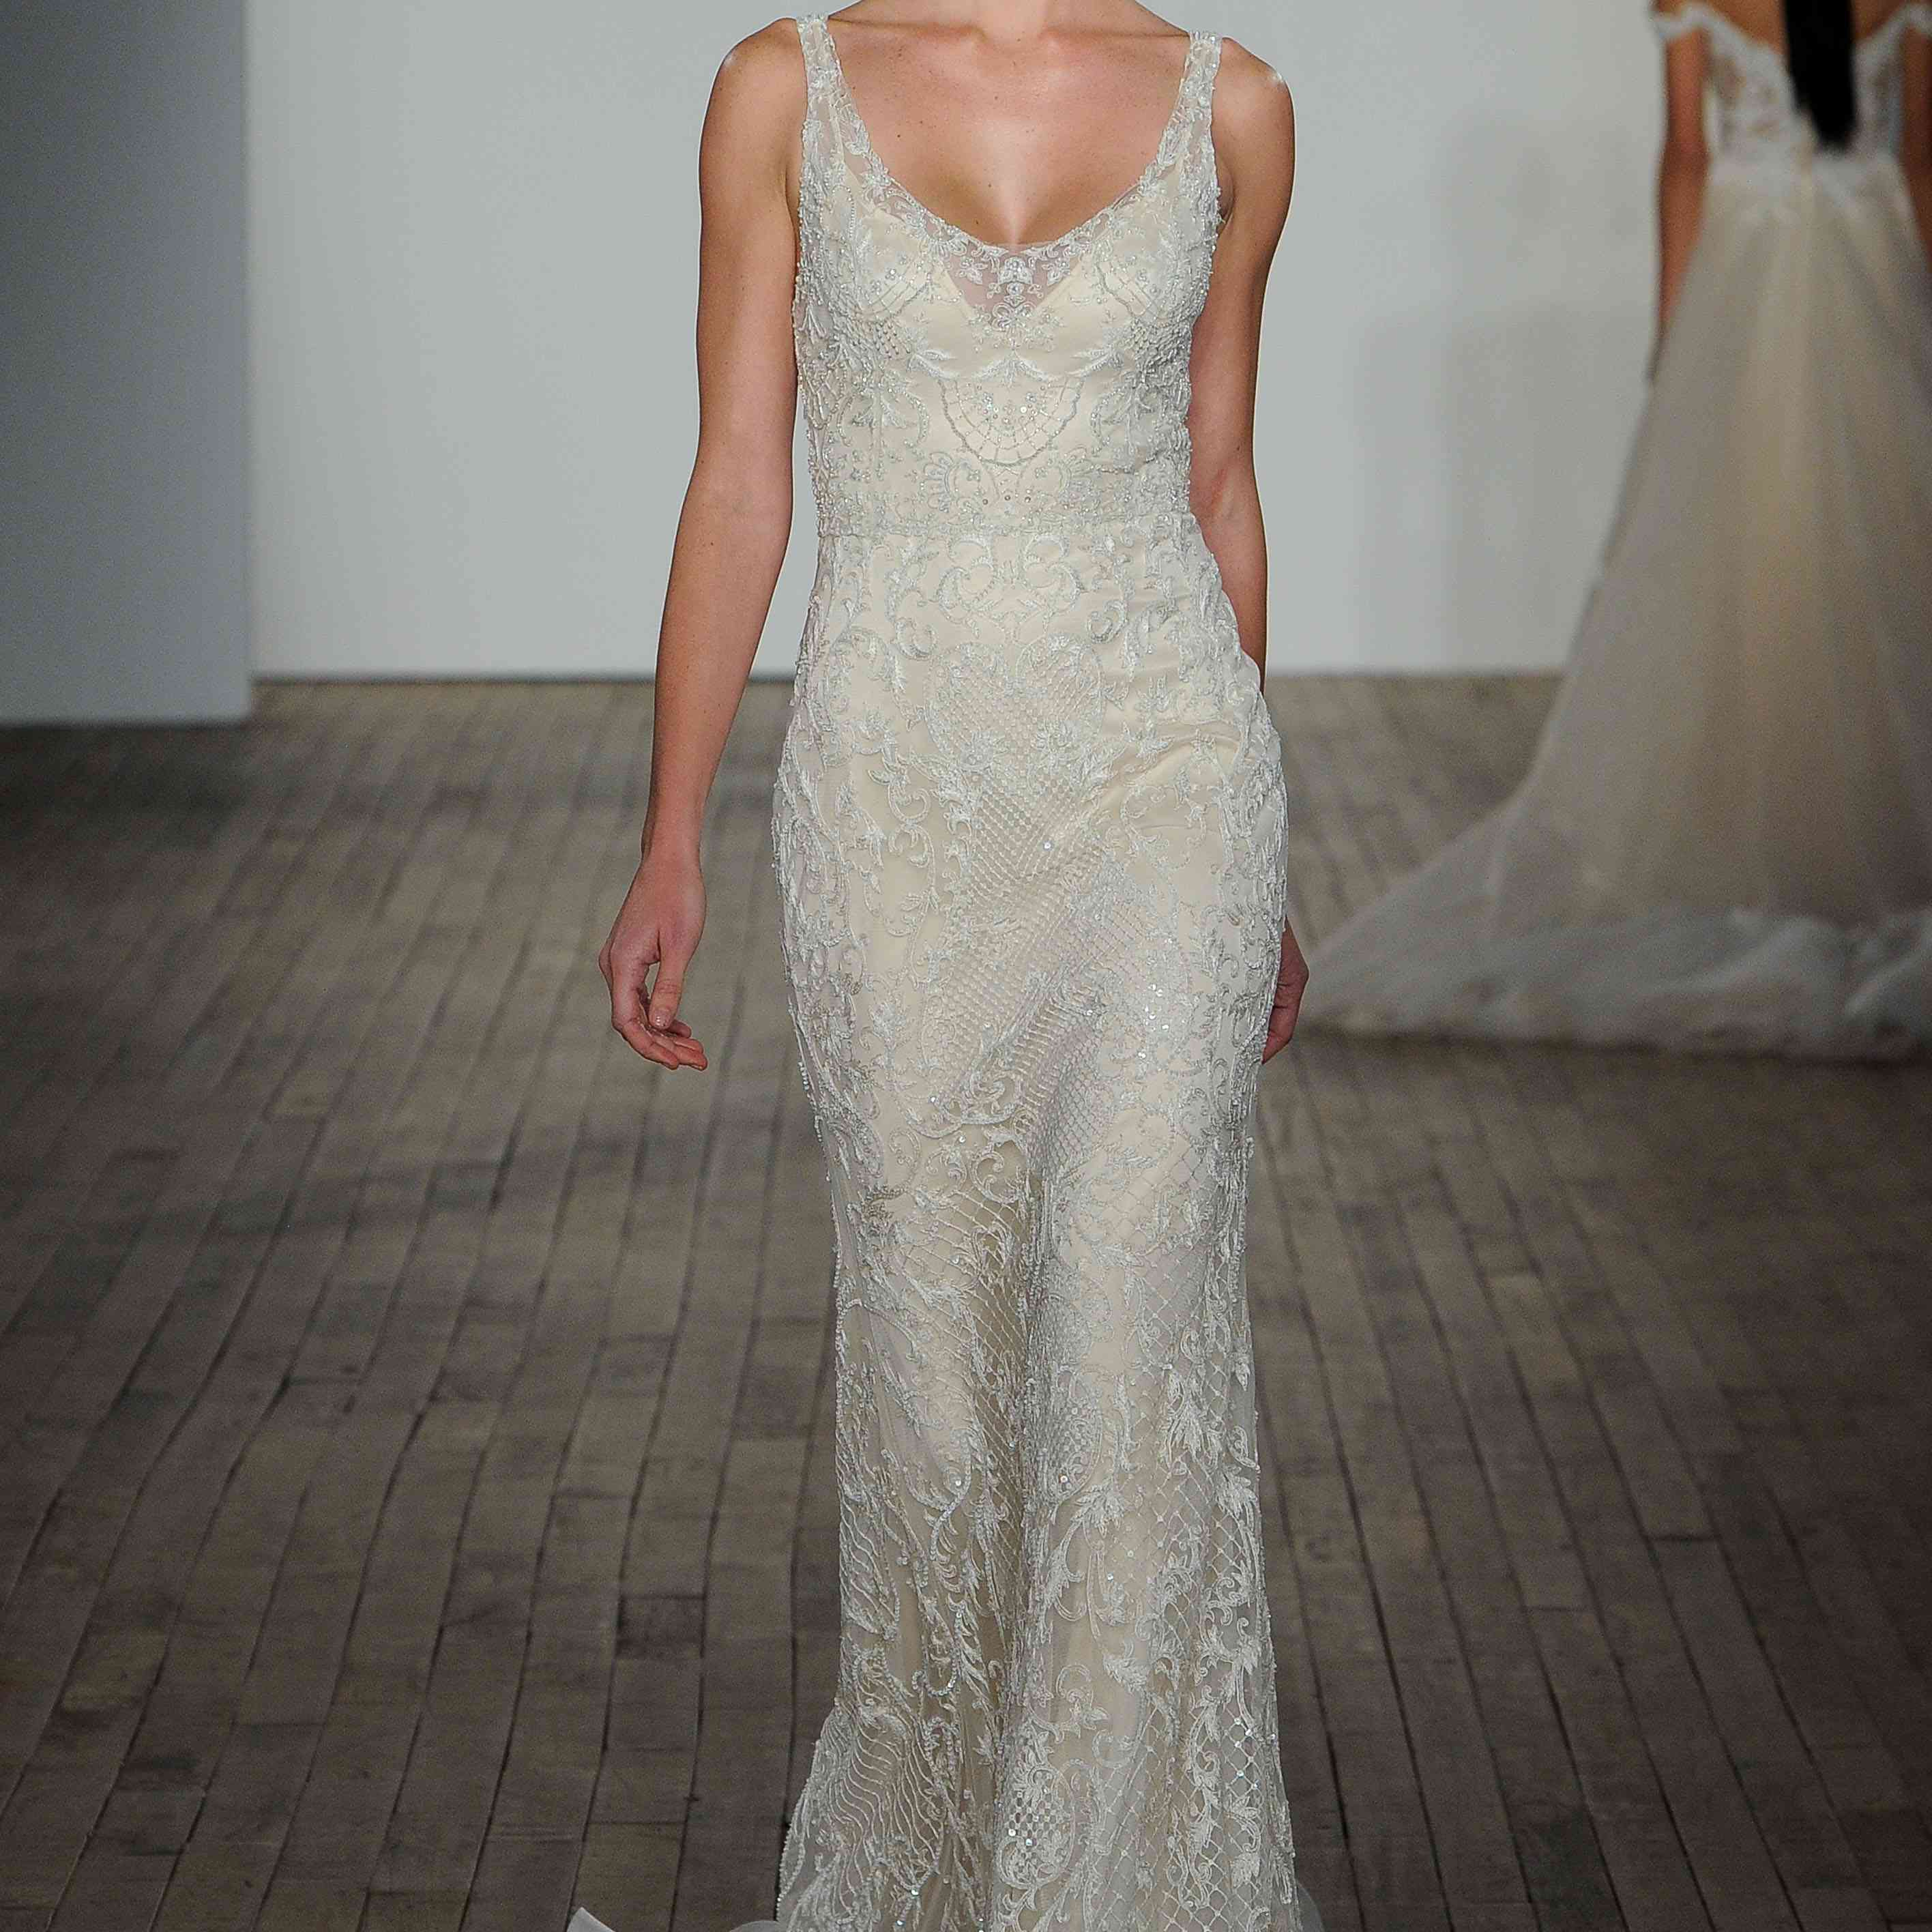 Cynthia fitted wedding dress by lazaro